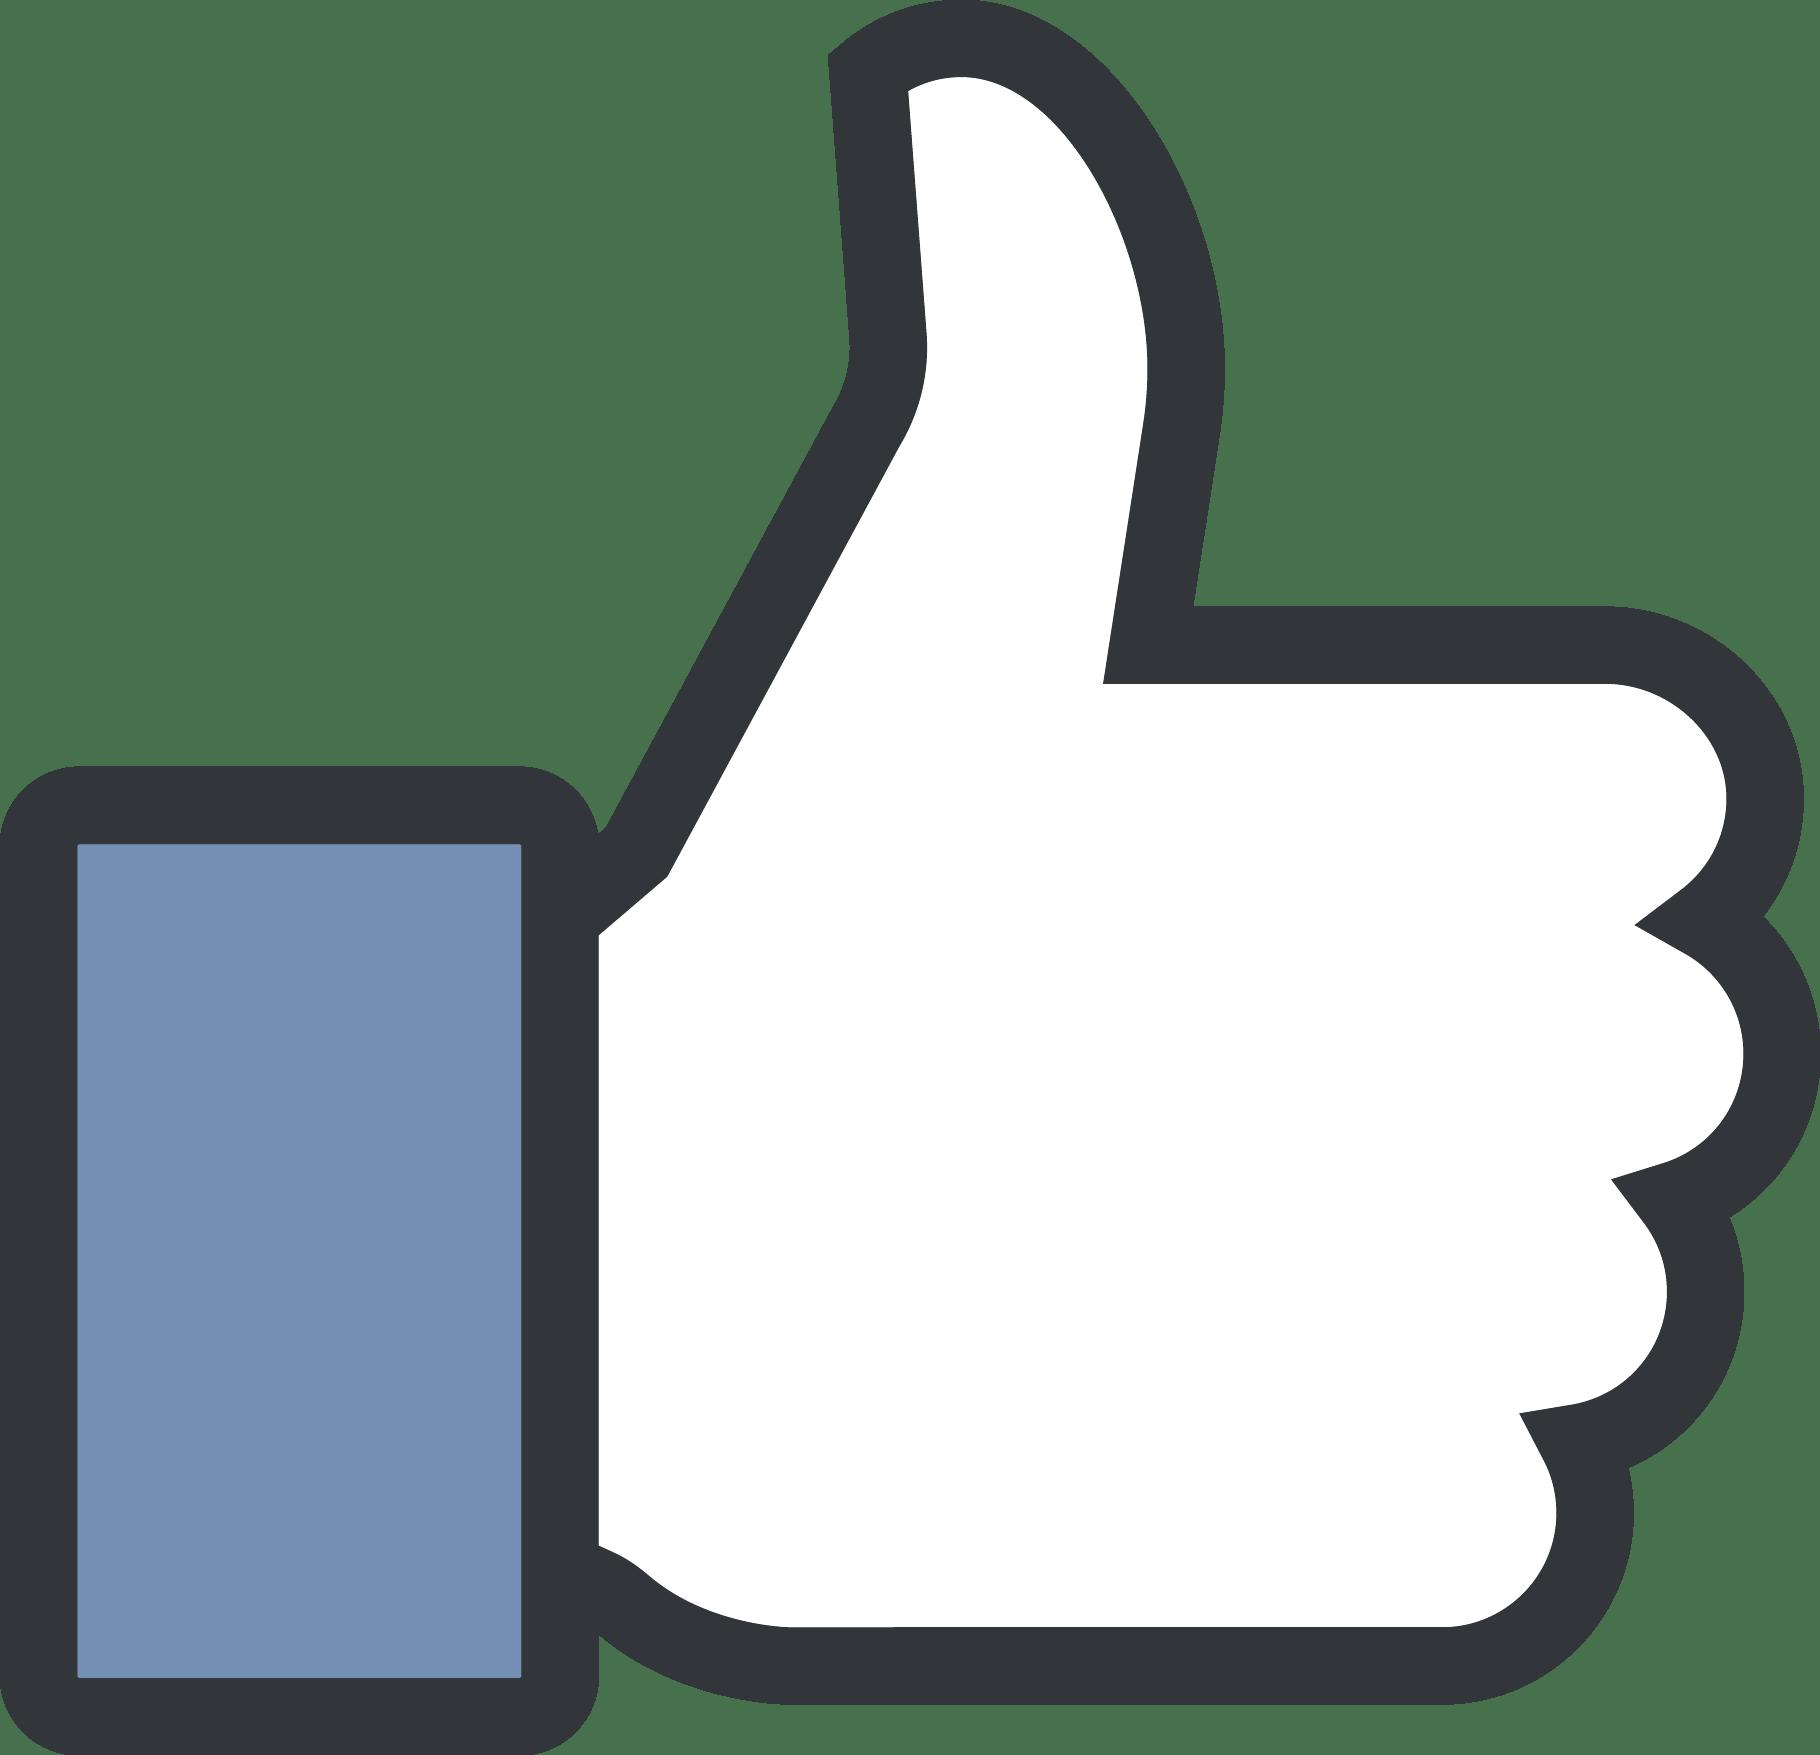 Facebook Like Logo Vector [EPS File]